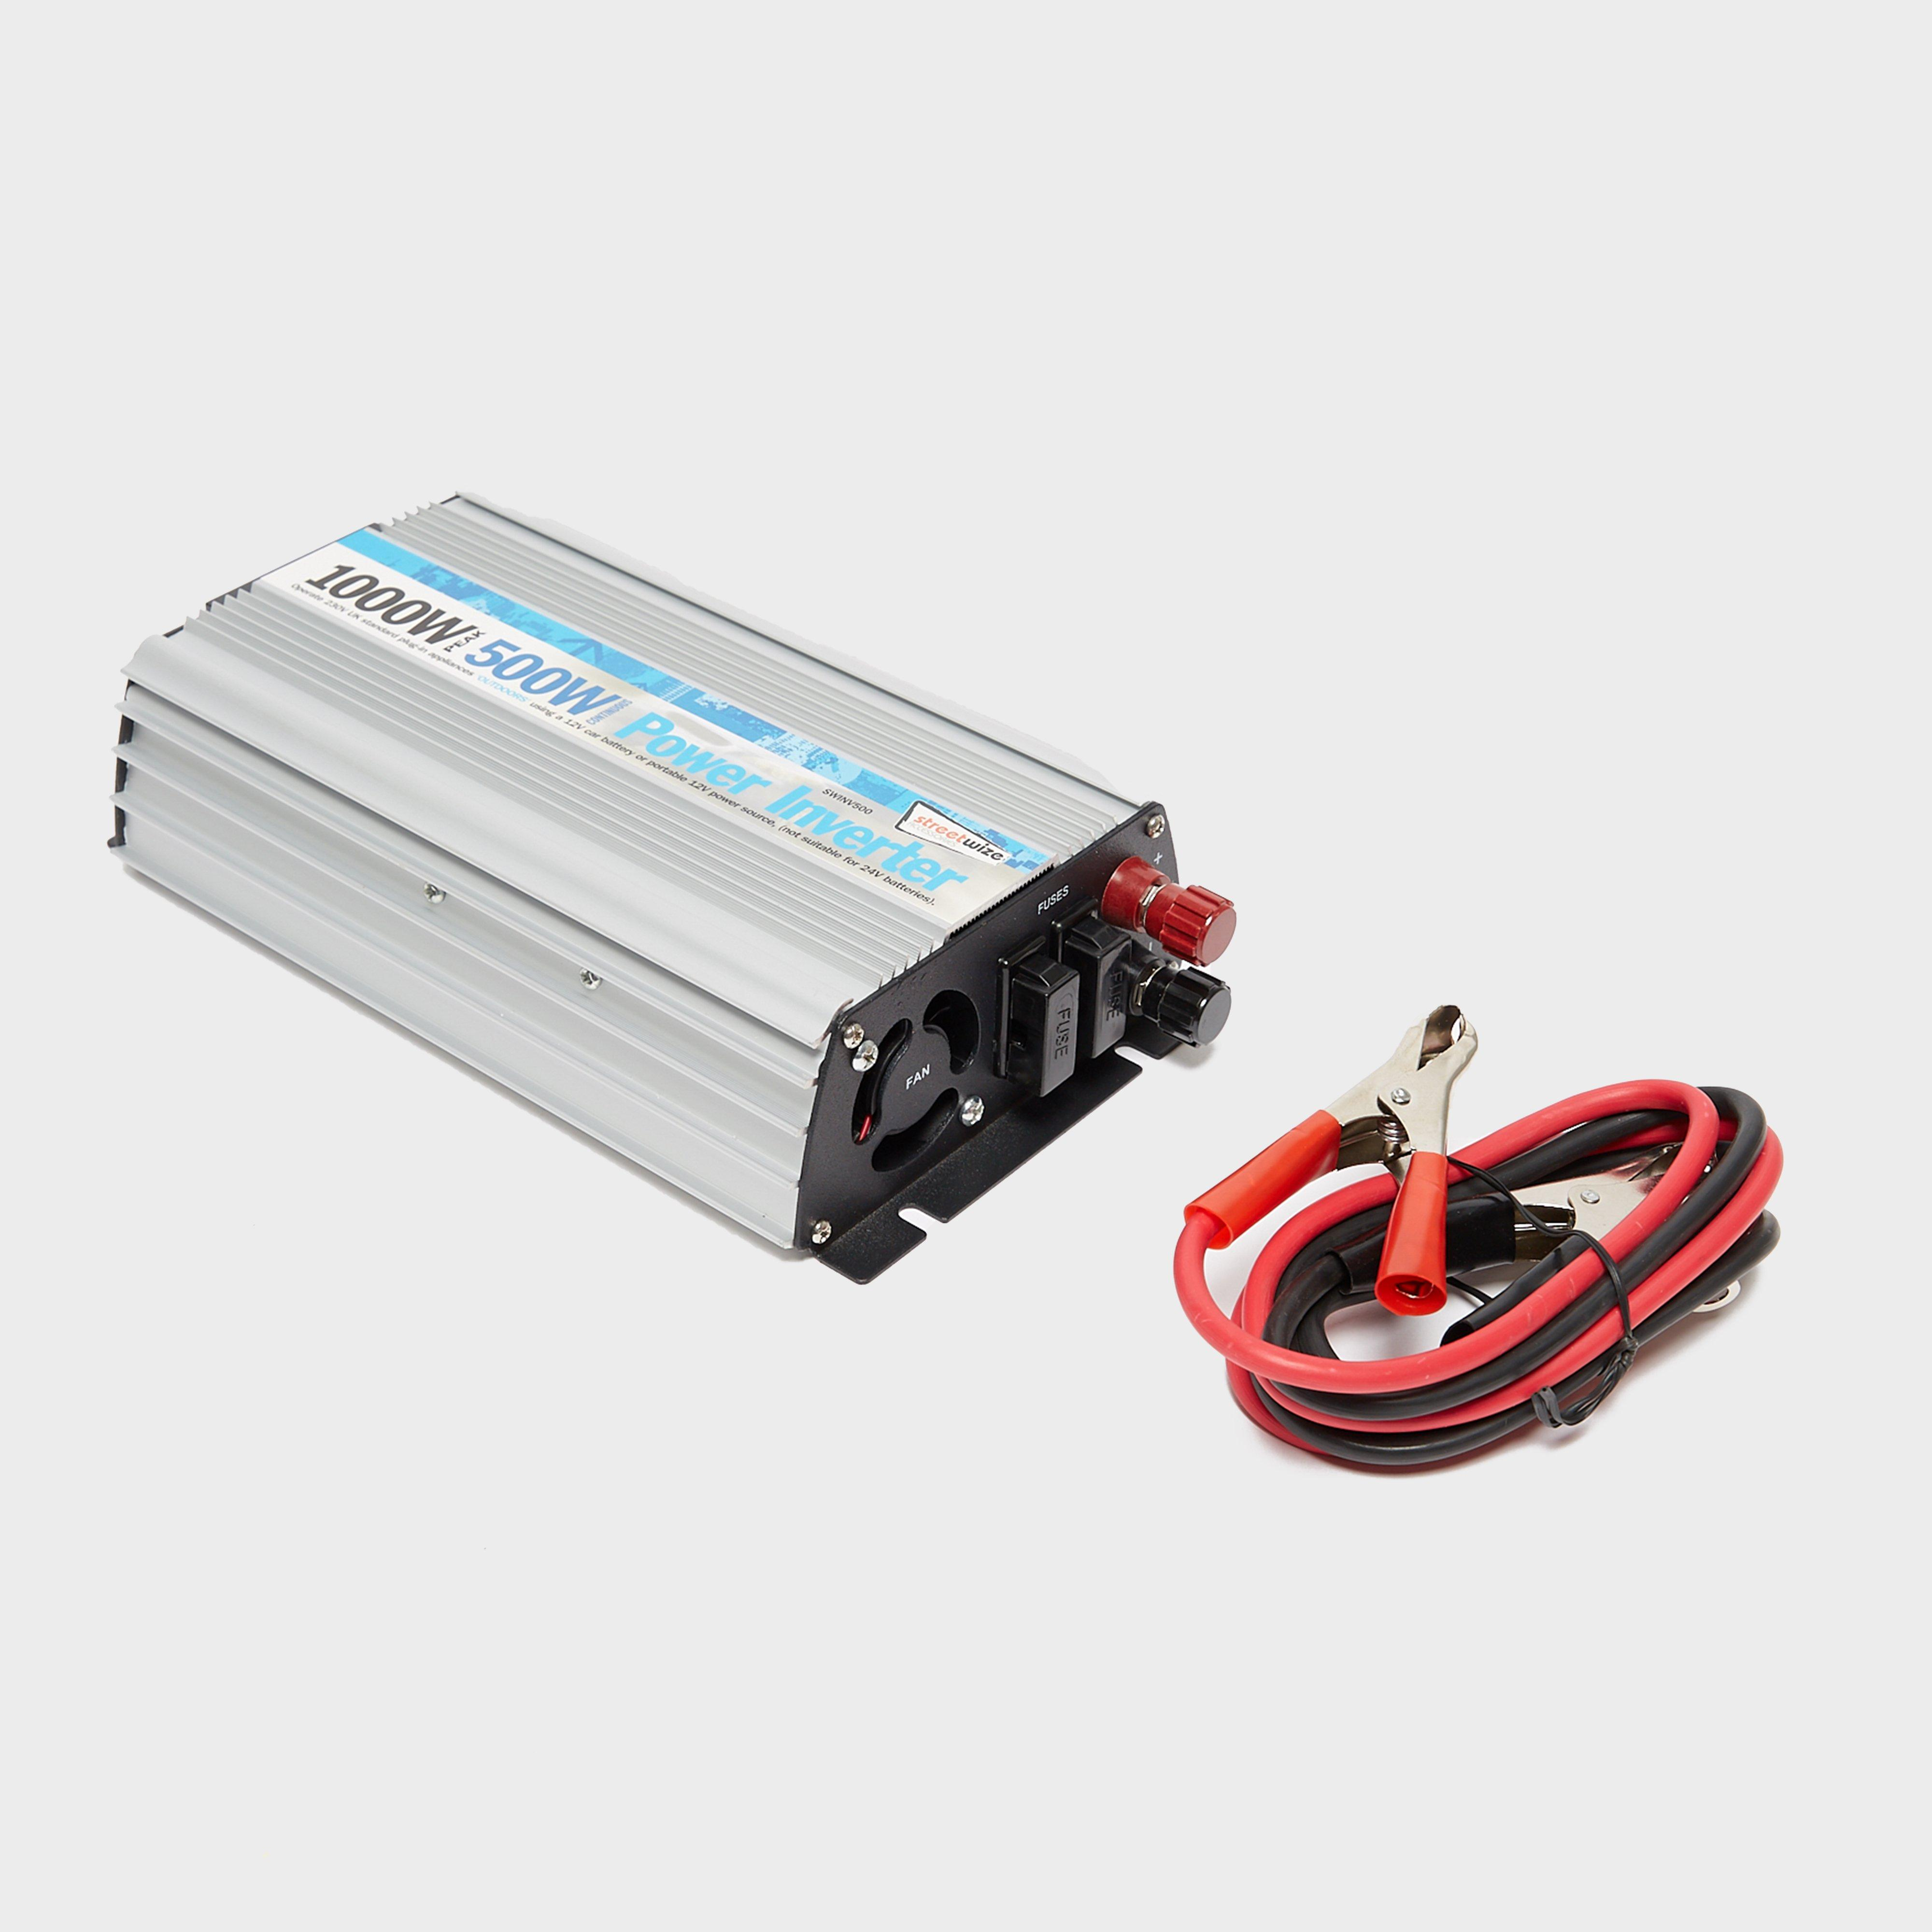 Streetwize 500w Inverter - Silver/inverter  Silver/inverter